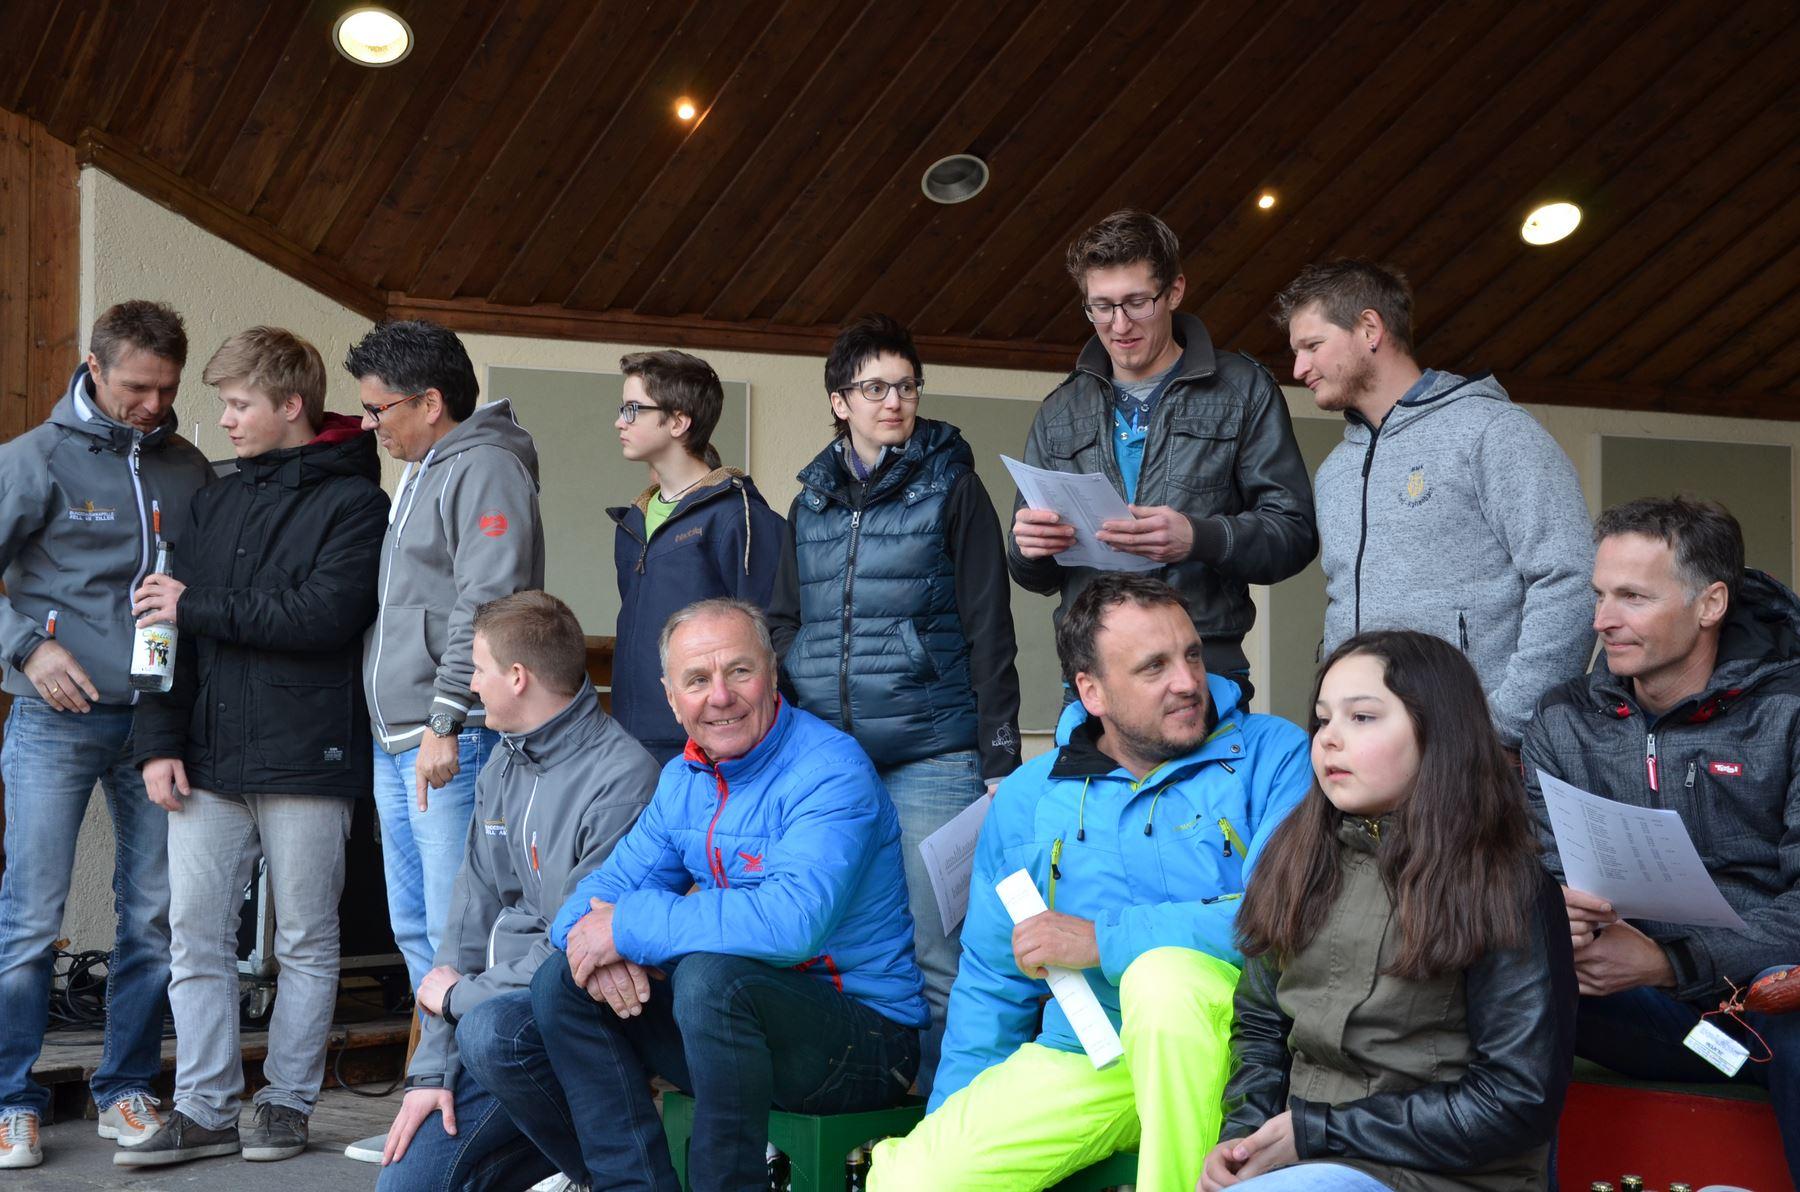 2015-03-22 BV Zillertal Skirennen 554.JPG